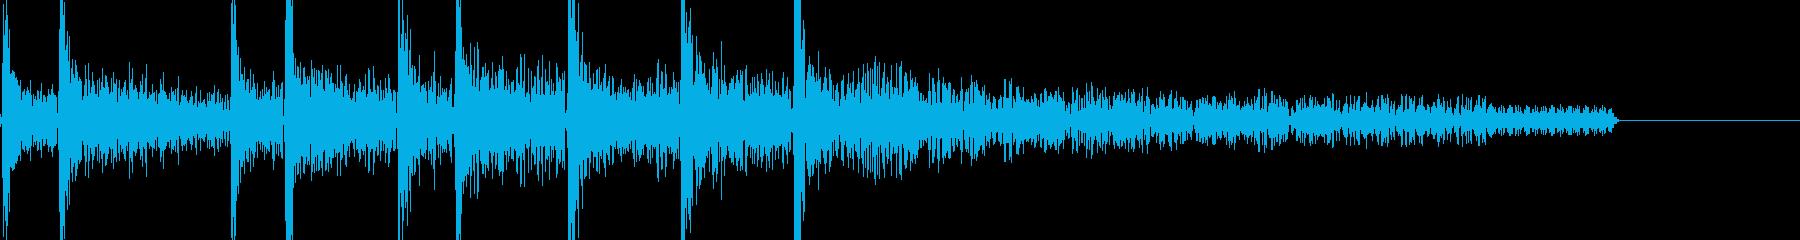 8bitアクションゲーム 死亡音の再生済みの波形